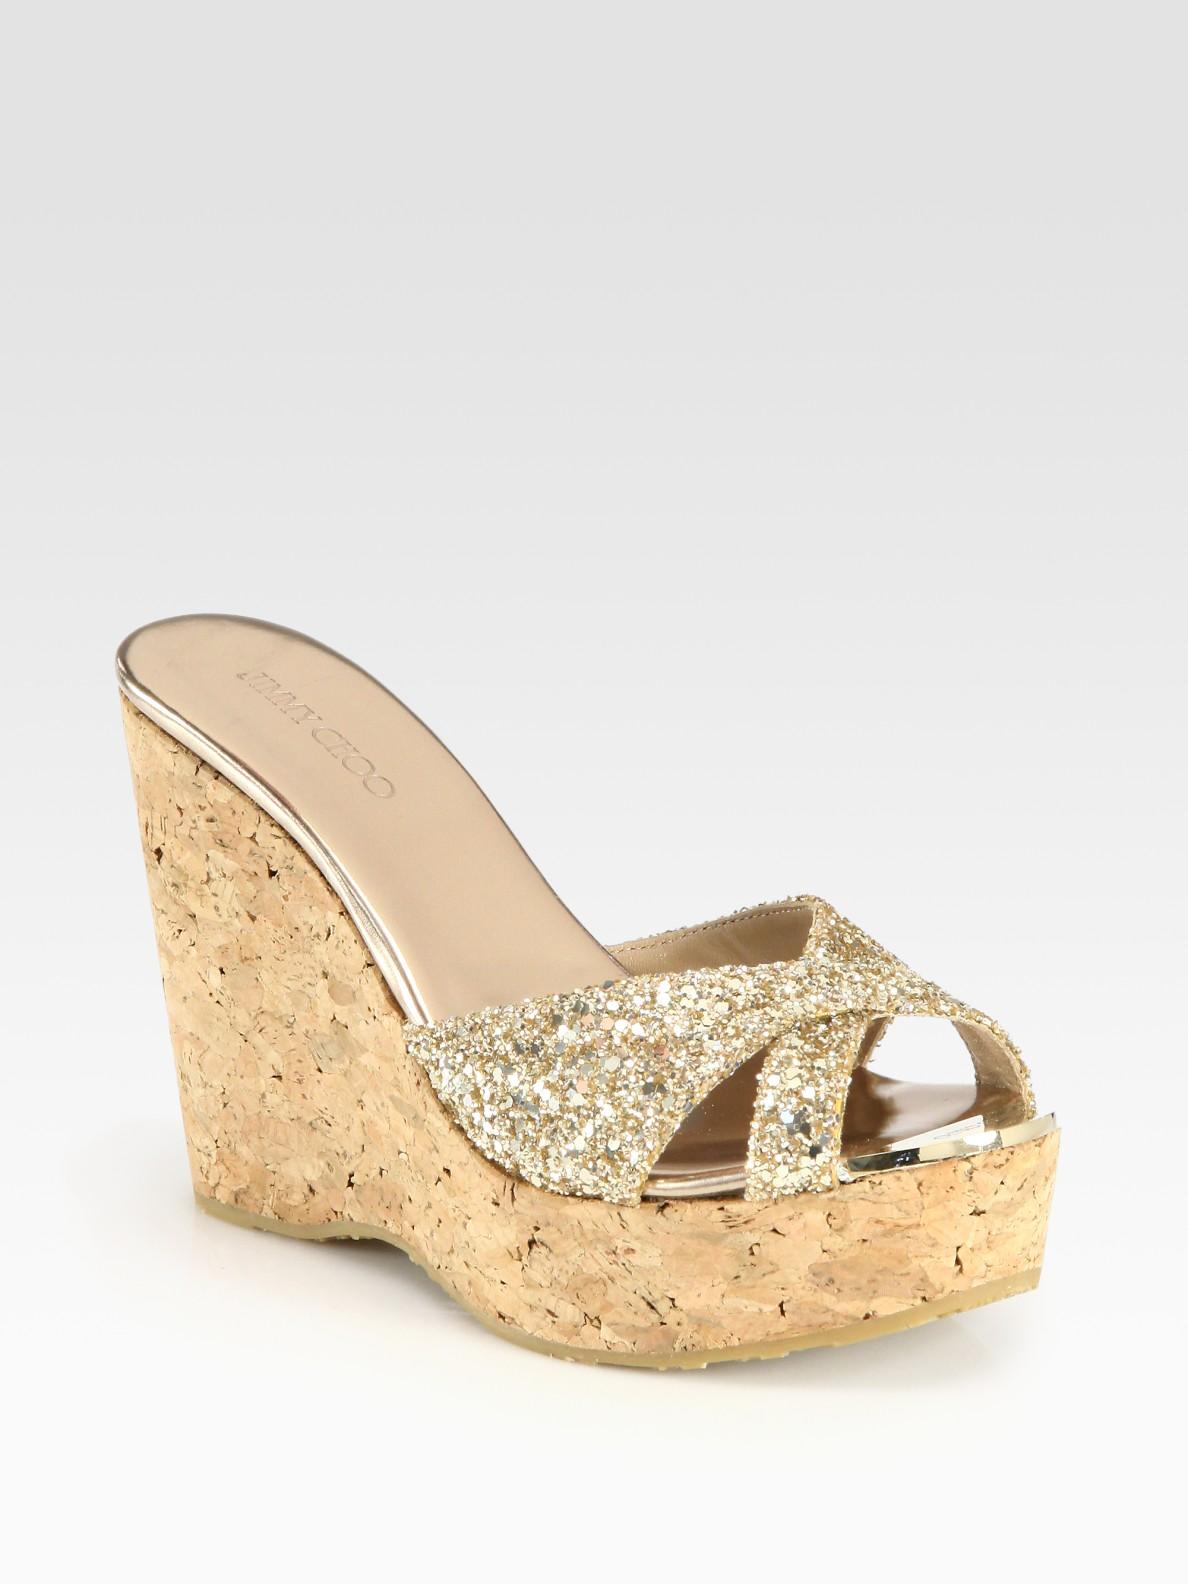 555b16e9de2 Lyst - Jimmy Choo Perfume Glitter Cork Wedge Sandals in Natural